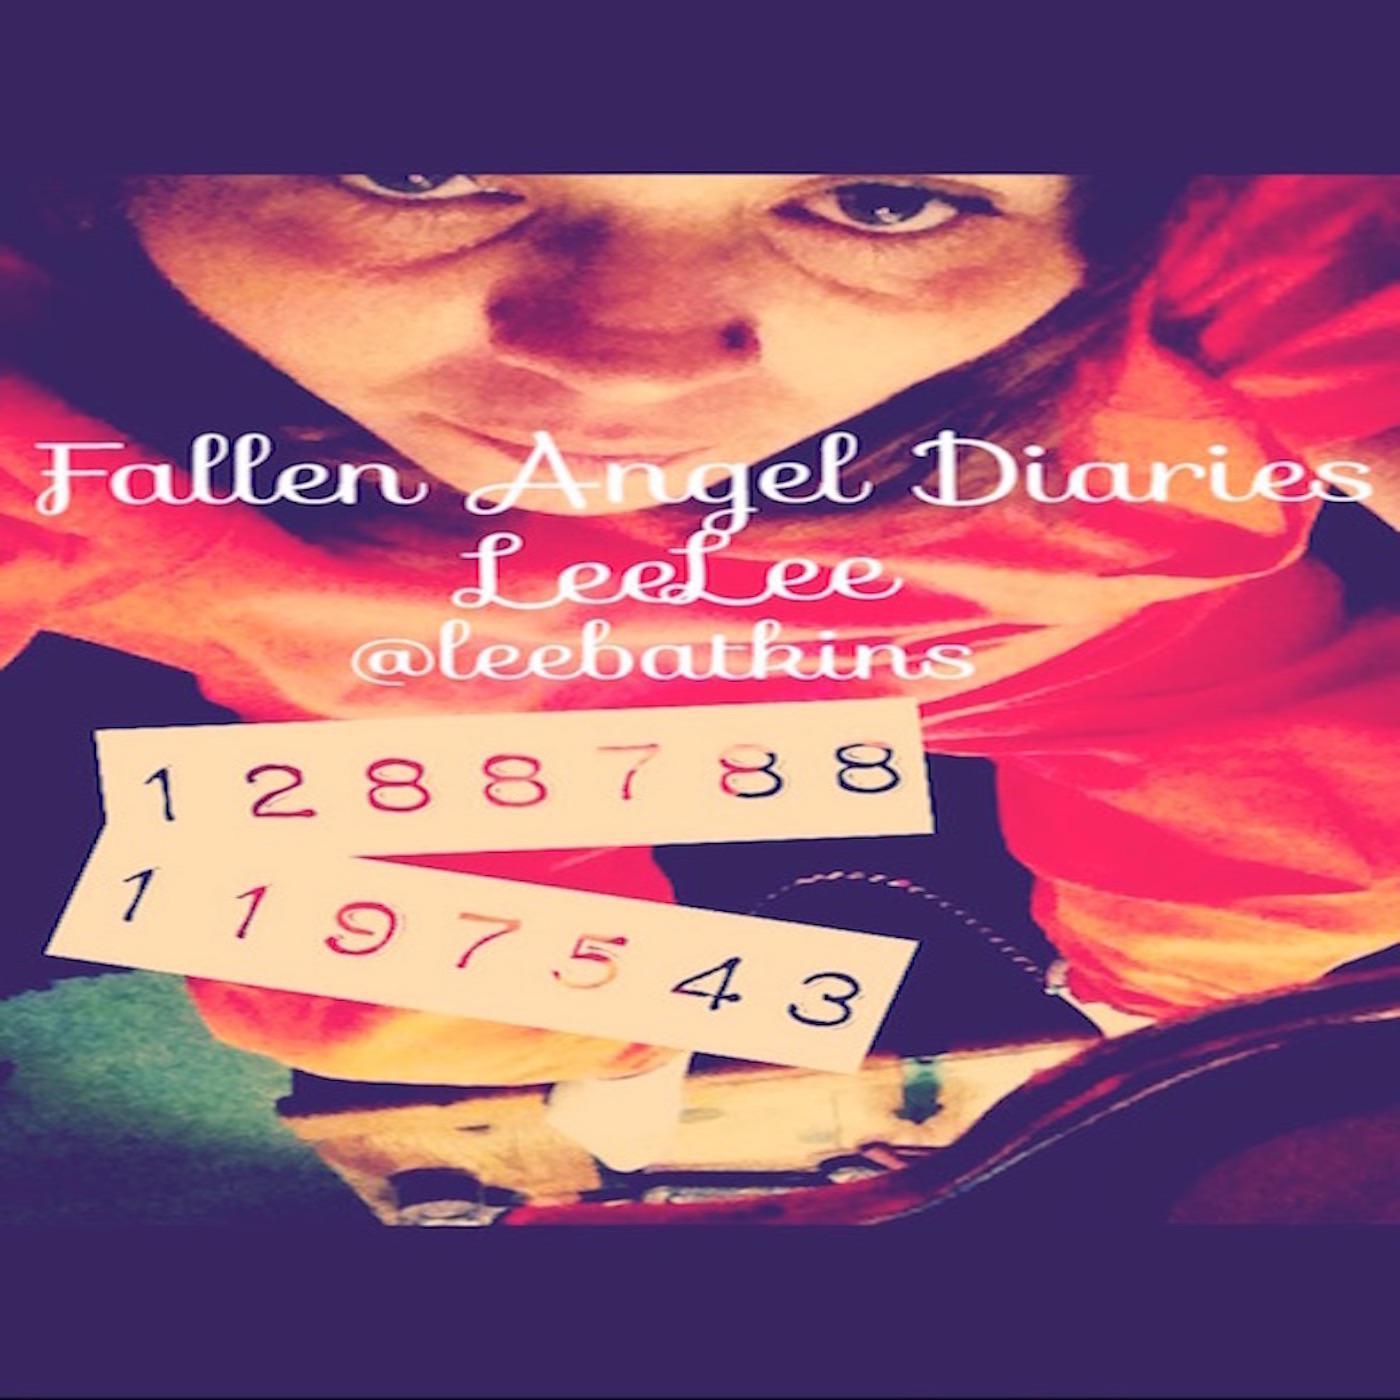 Fallen Angel Diaries (podcast) - Lee Belinda Atkins | Listen